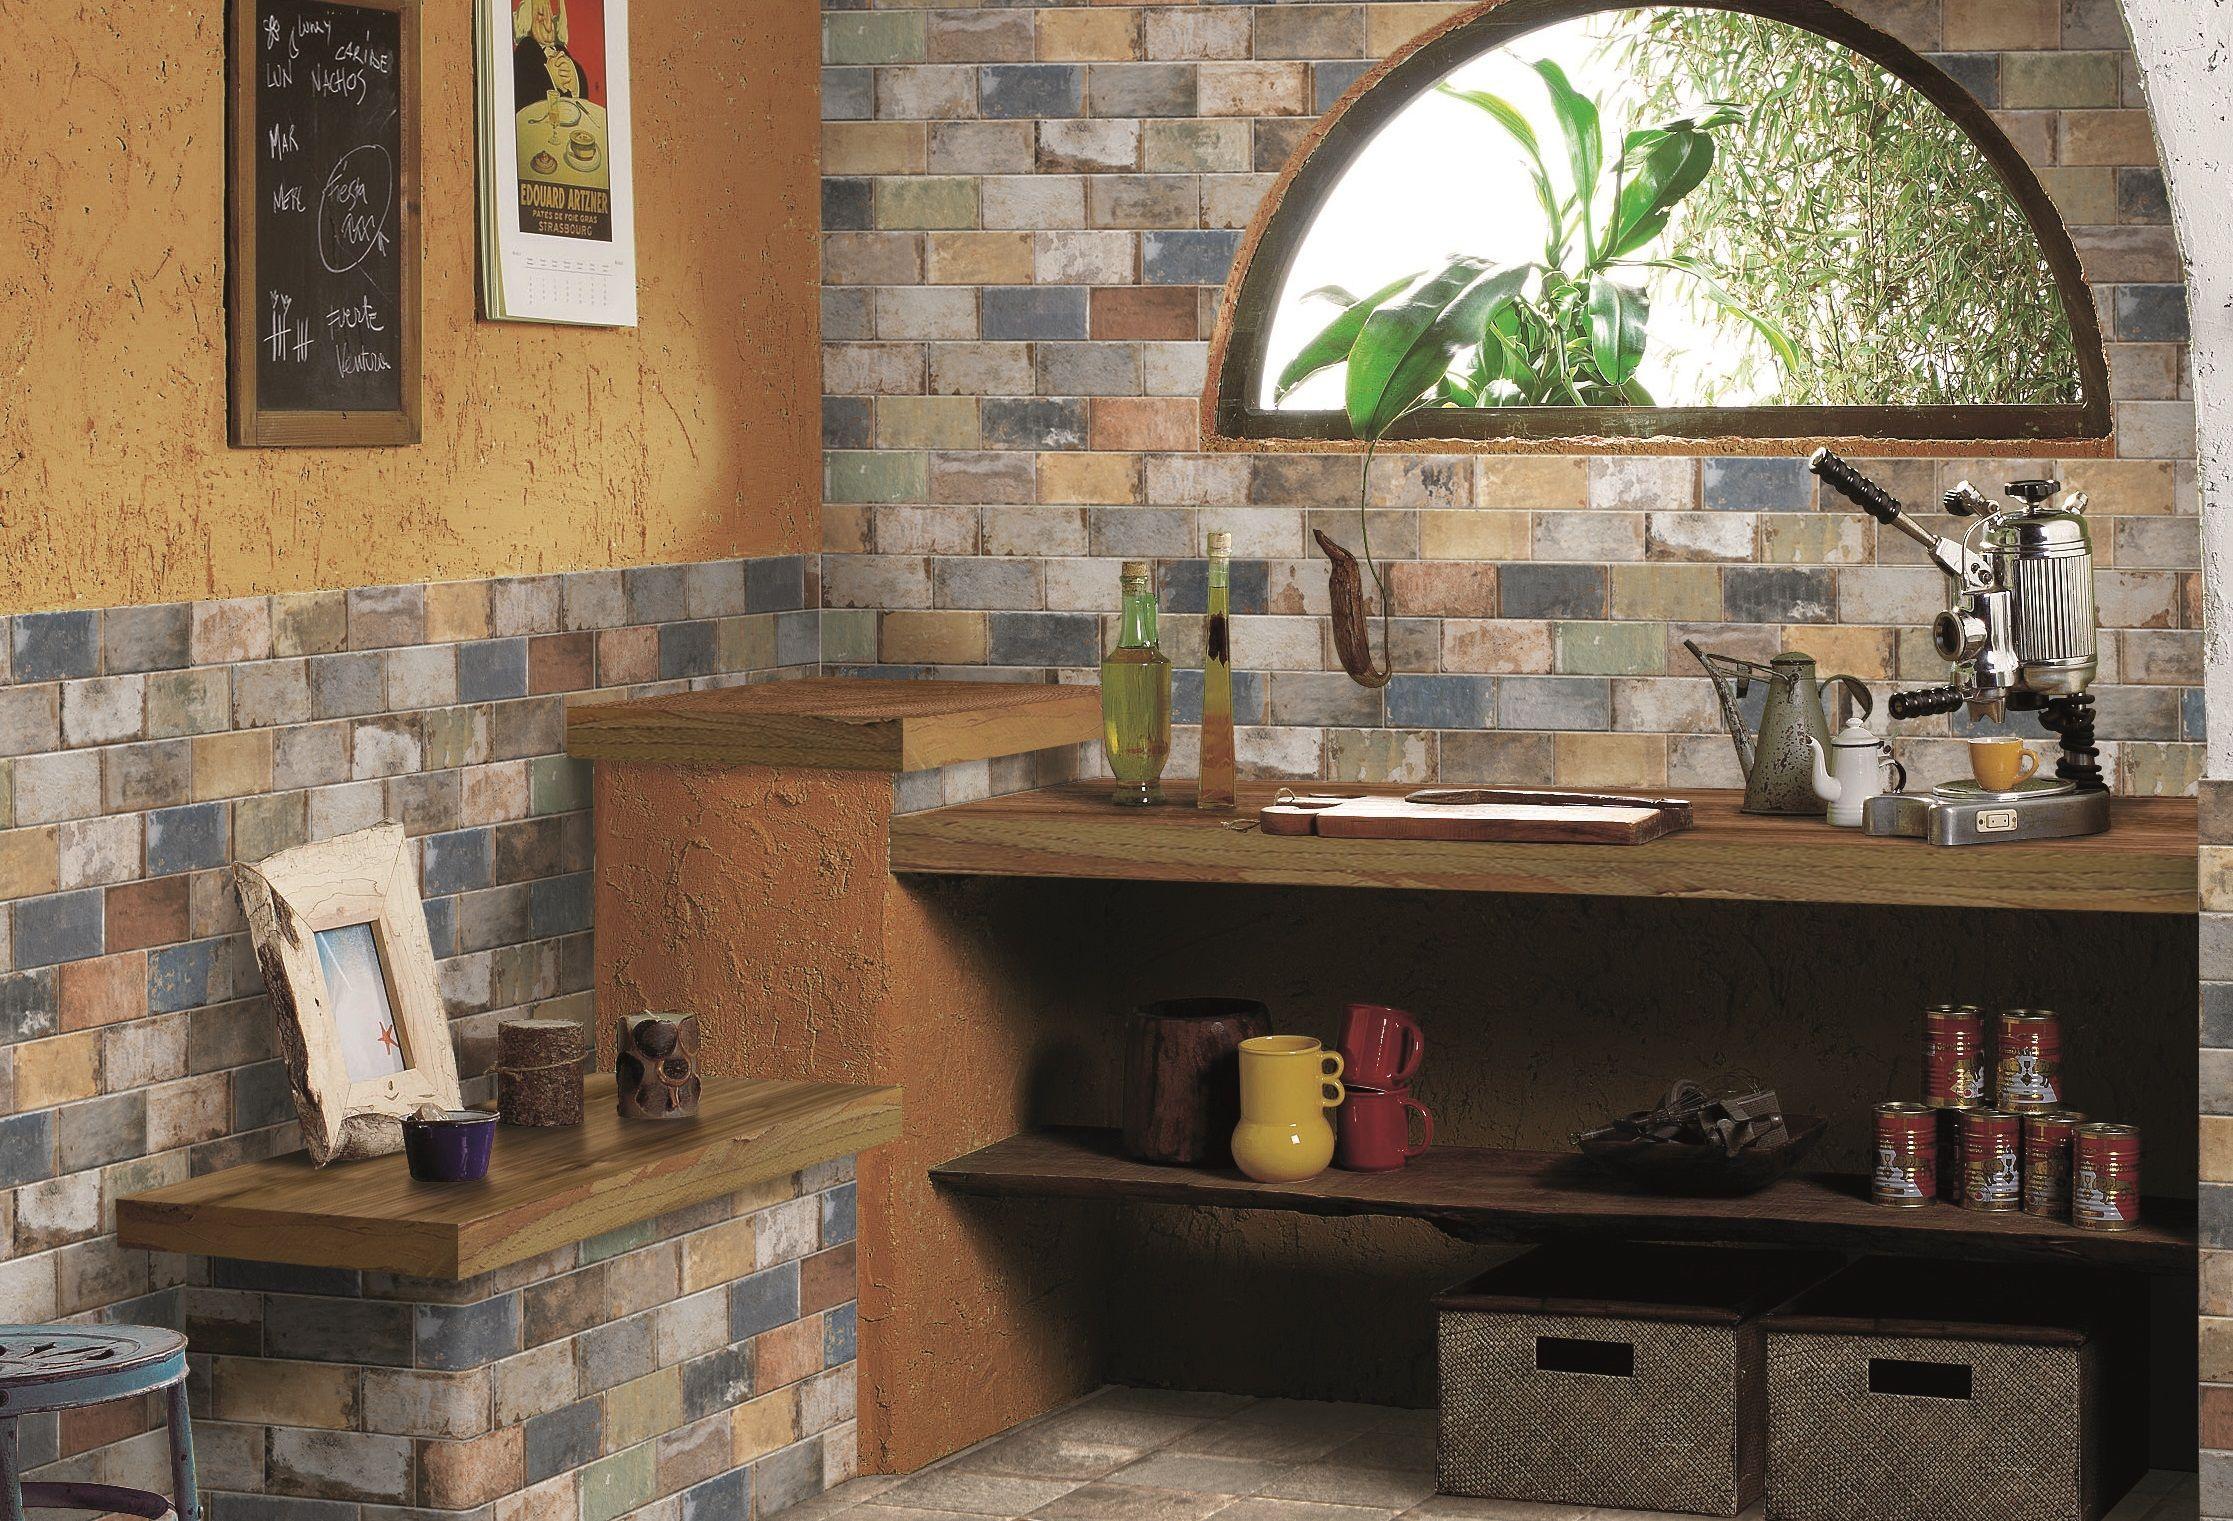 Cir havana mix tiles kitchen tiles kitchen tiles